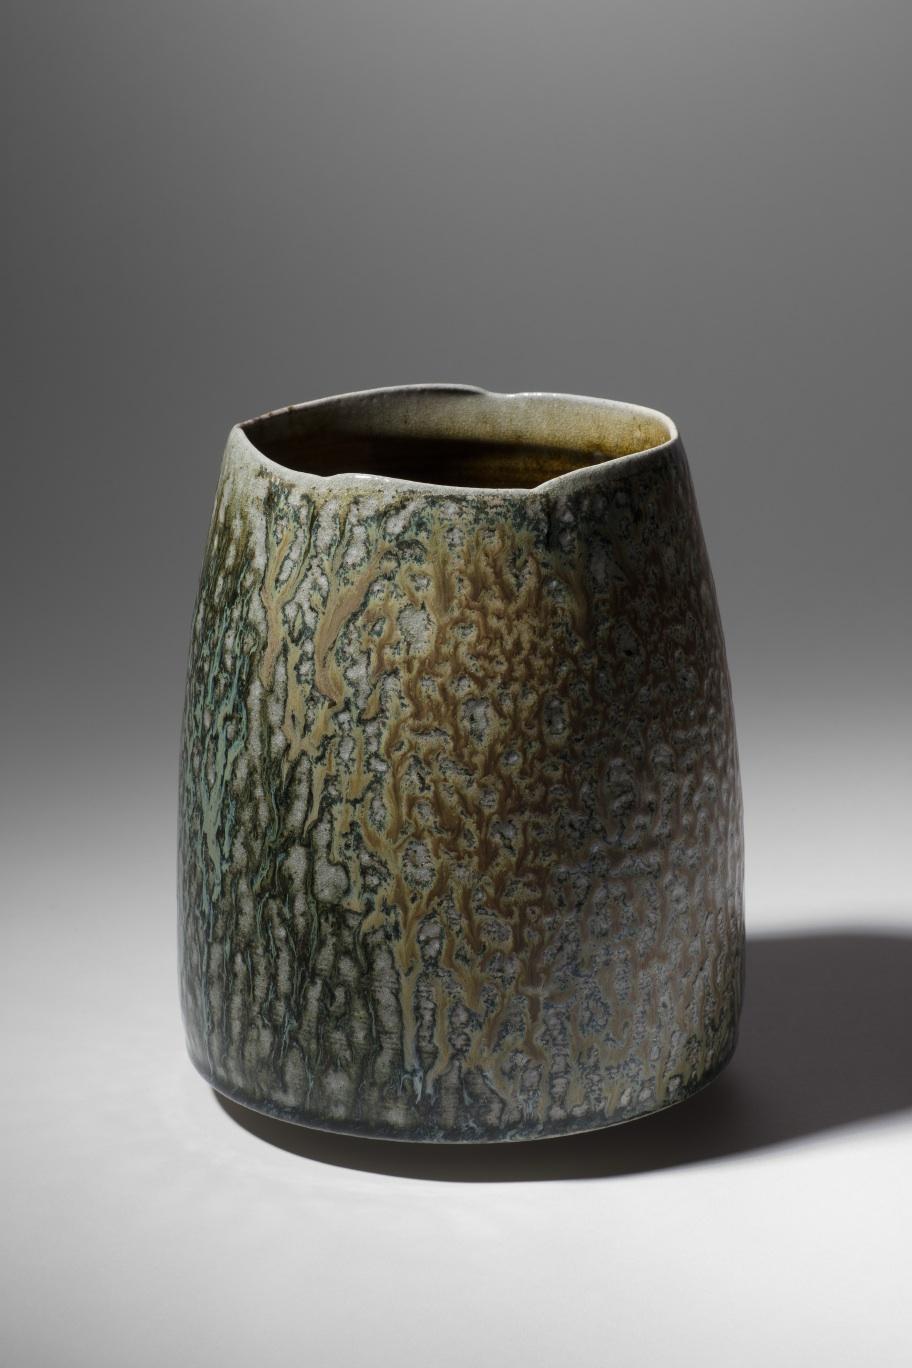 Mandy Parslow, MP05 Barrel Vessel, wood fired salt glazed stoneware, 21 x 17cm, EUR 300